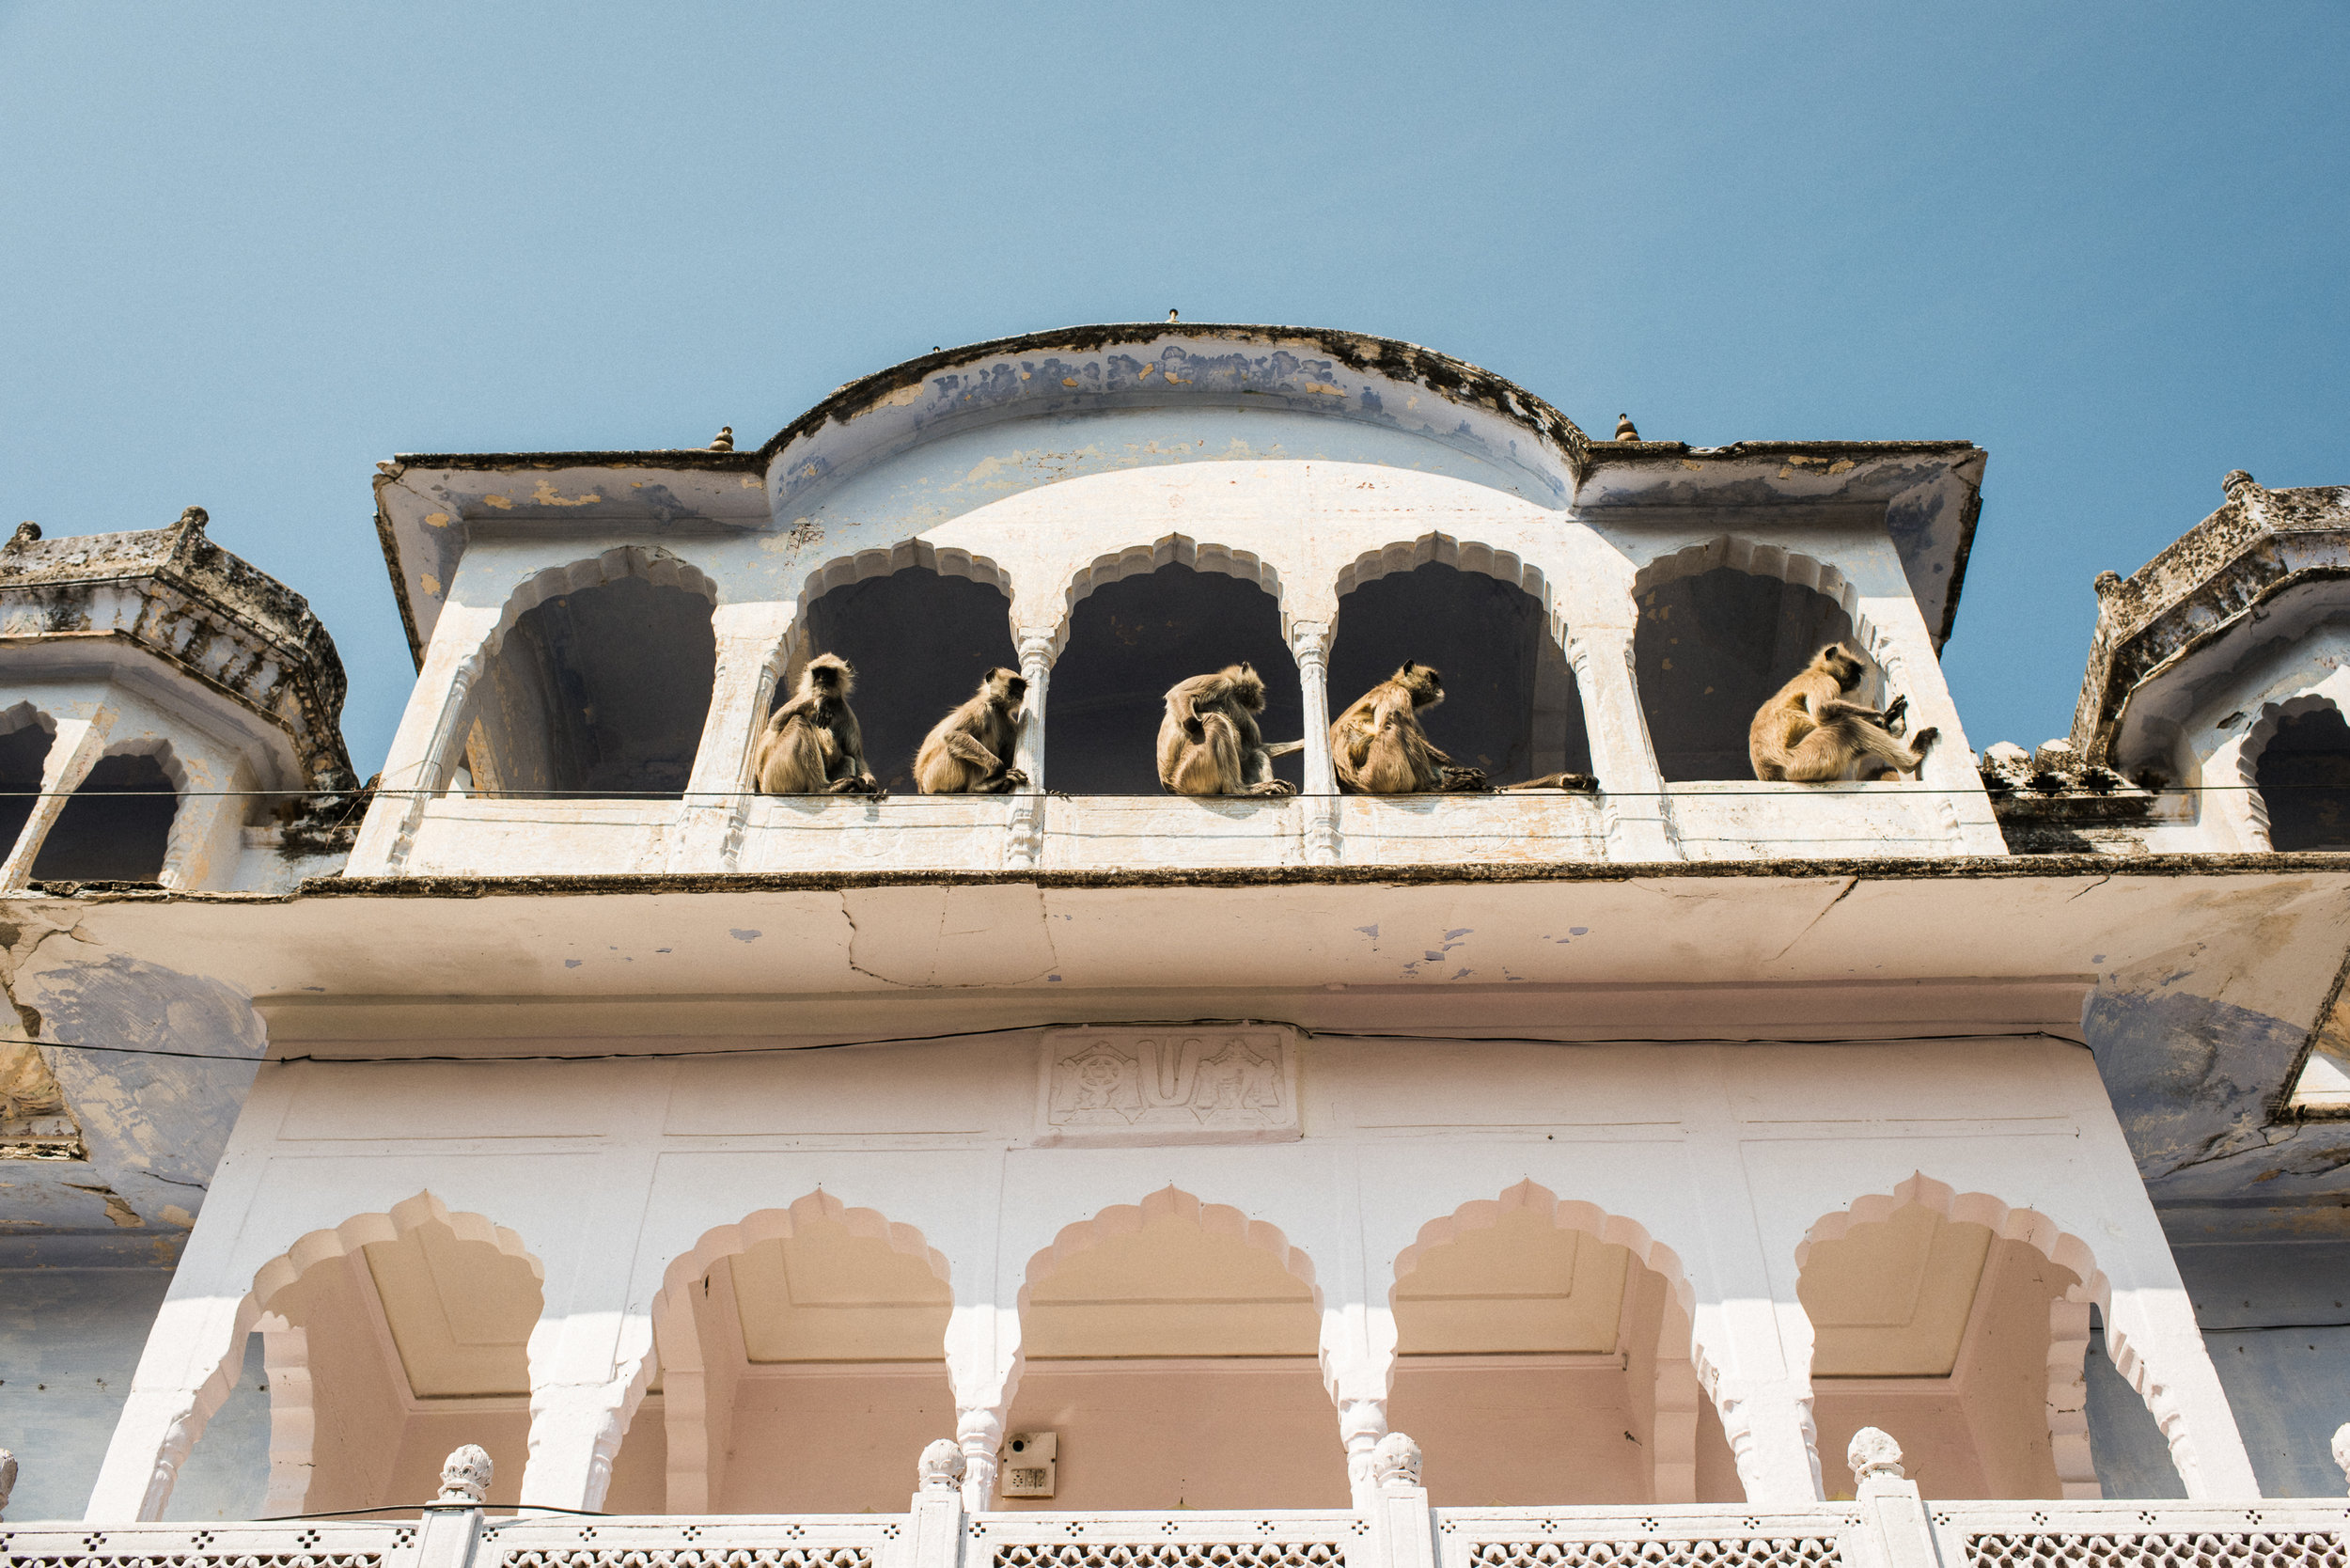 Pushkar_India_TaraShupe_Photography_022.jpg